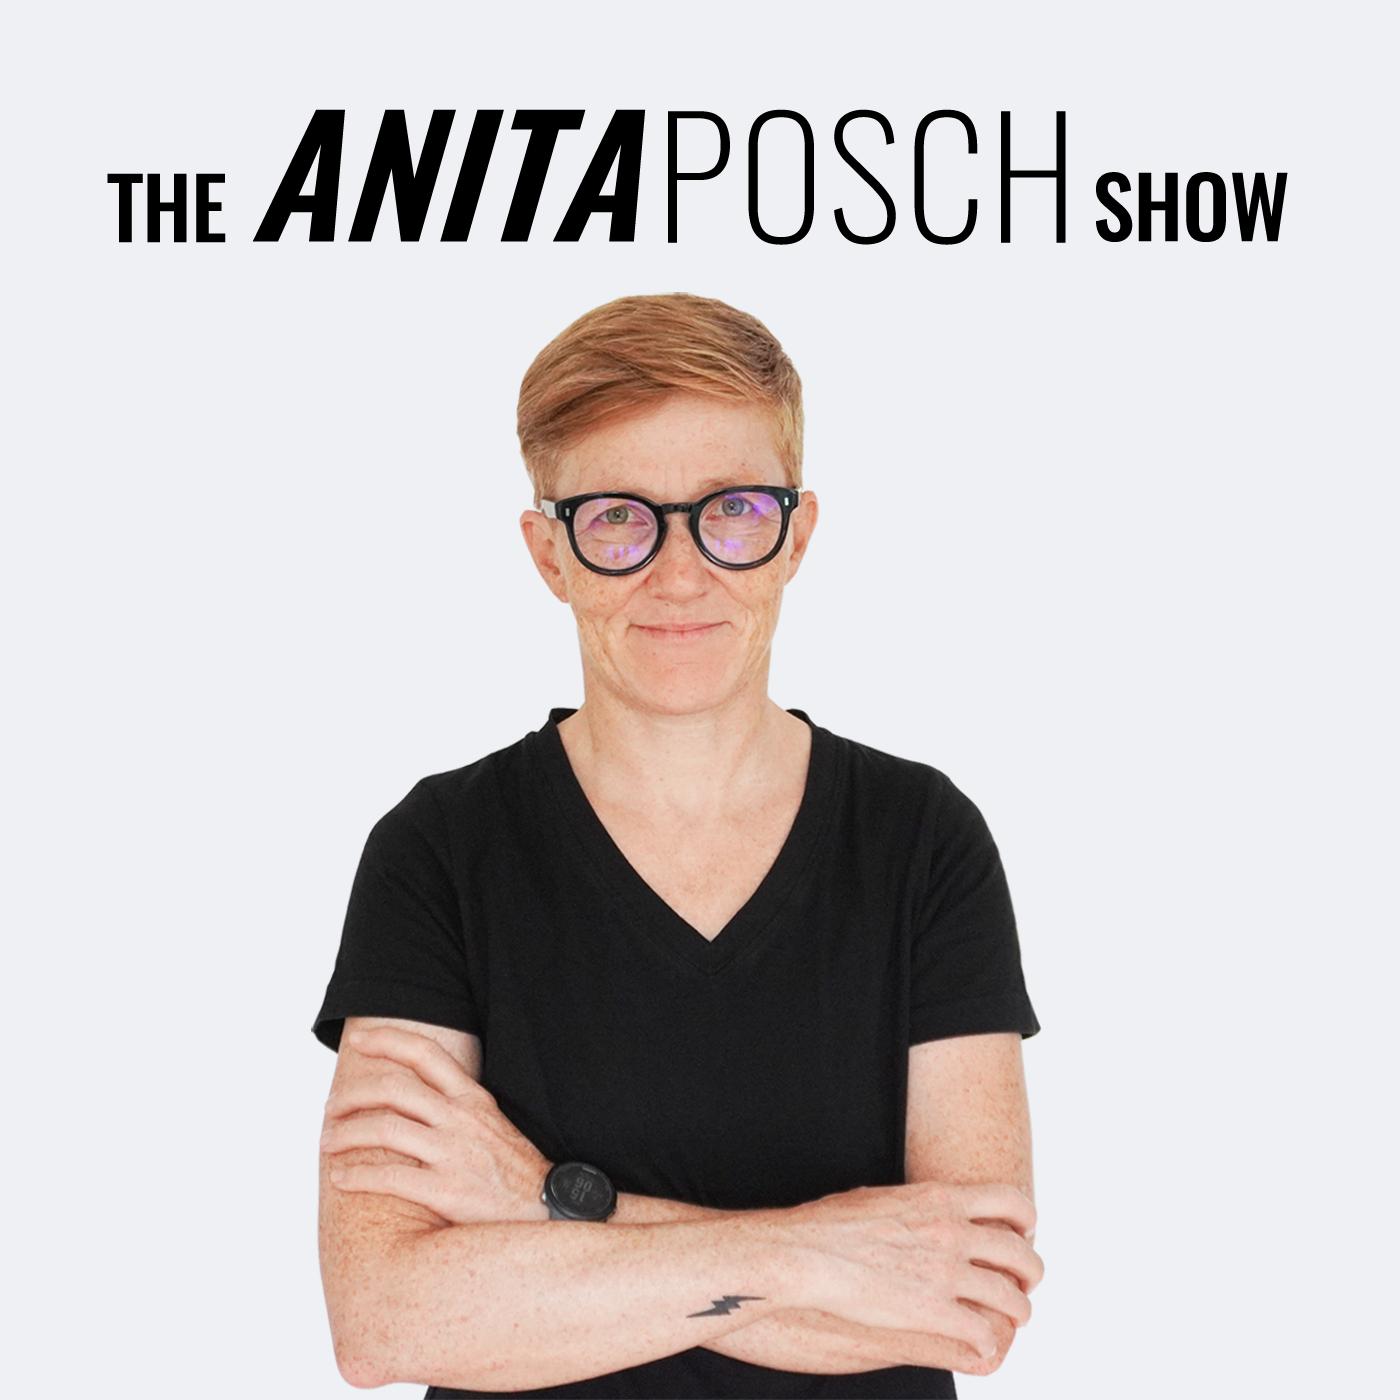 The Anita Posch Show: A Bitcoin only podcast